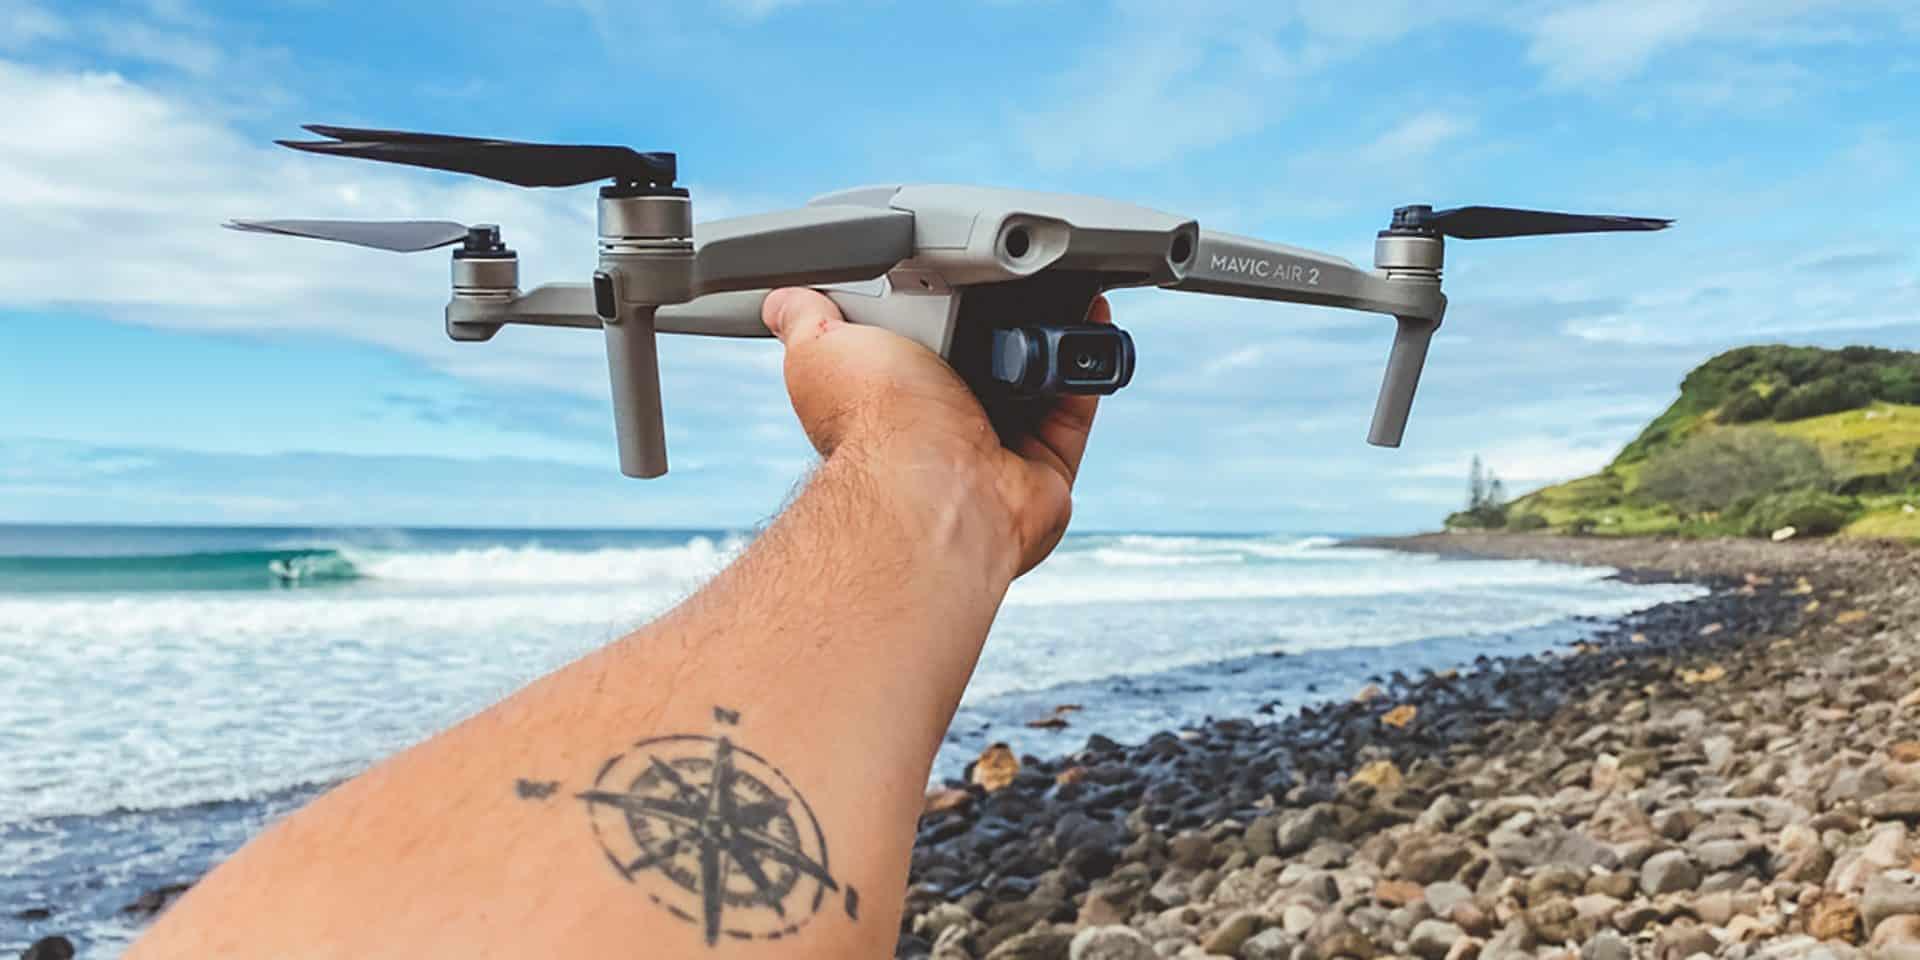 review dji mavic air 2 best travel drone-3